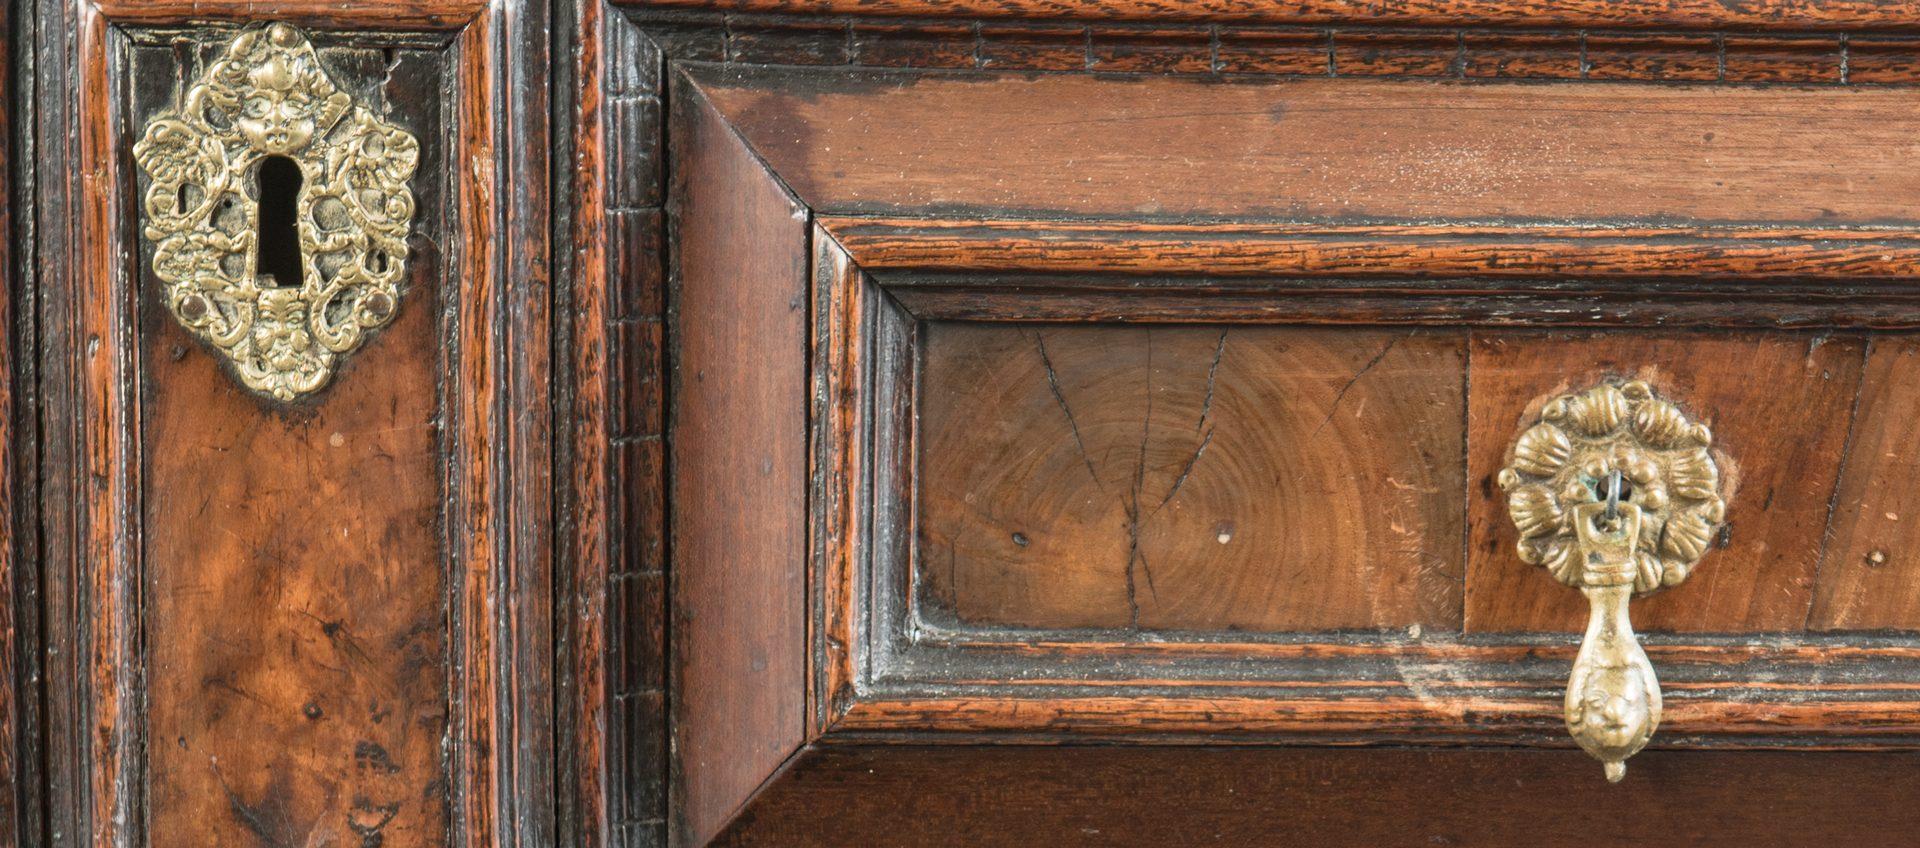 Lot 94: Early Oak Paneled Chest